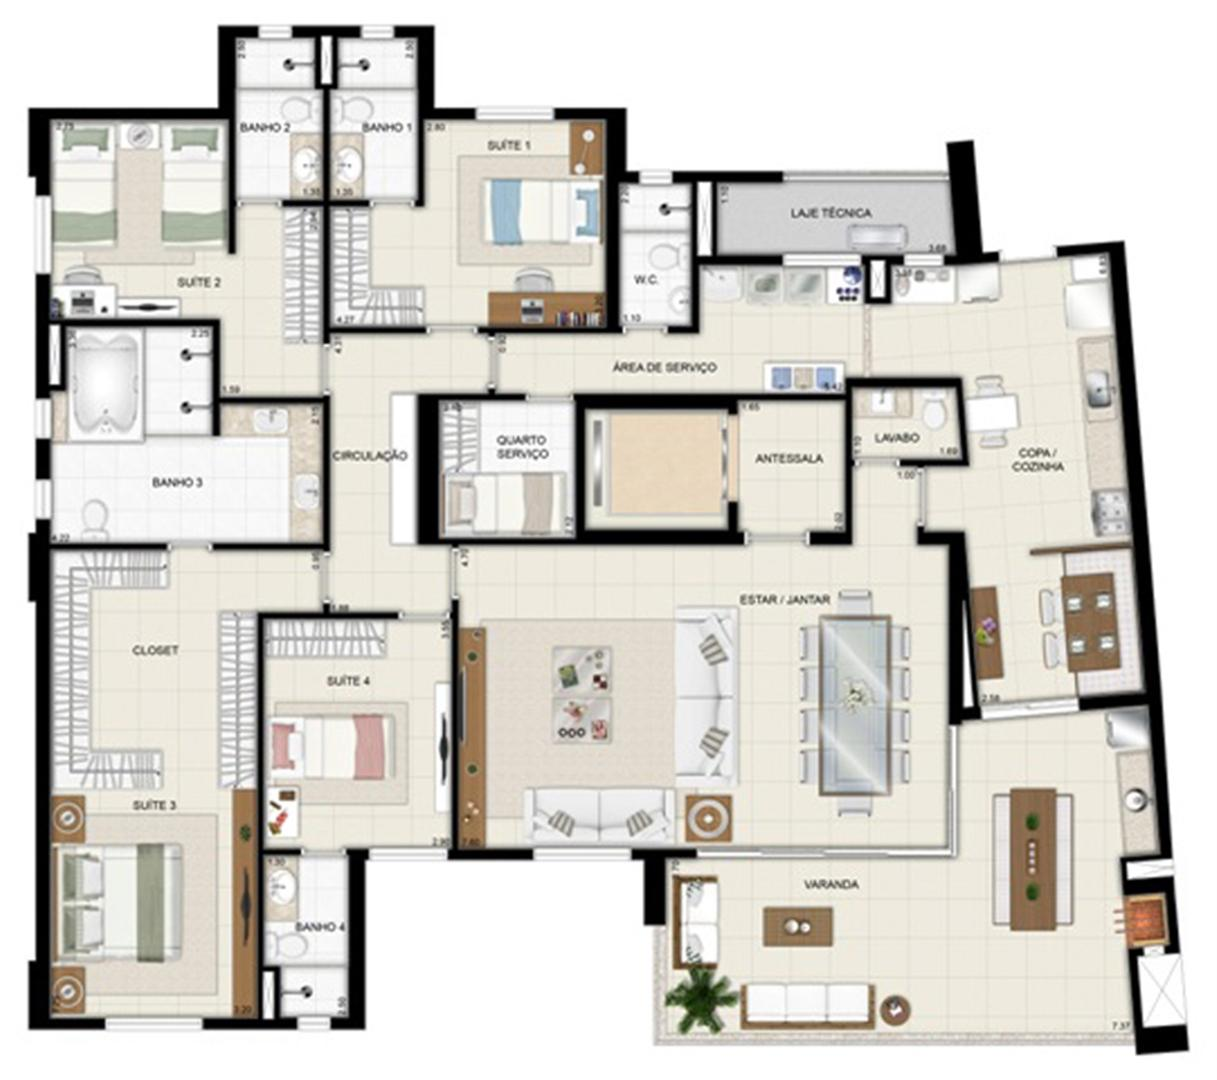 Planta tipo - TorreParc - Final 01 233 m² | Chateau Marista LifeStyle – Apartamento no  Setor Marista - Goiânia - Goiás